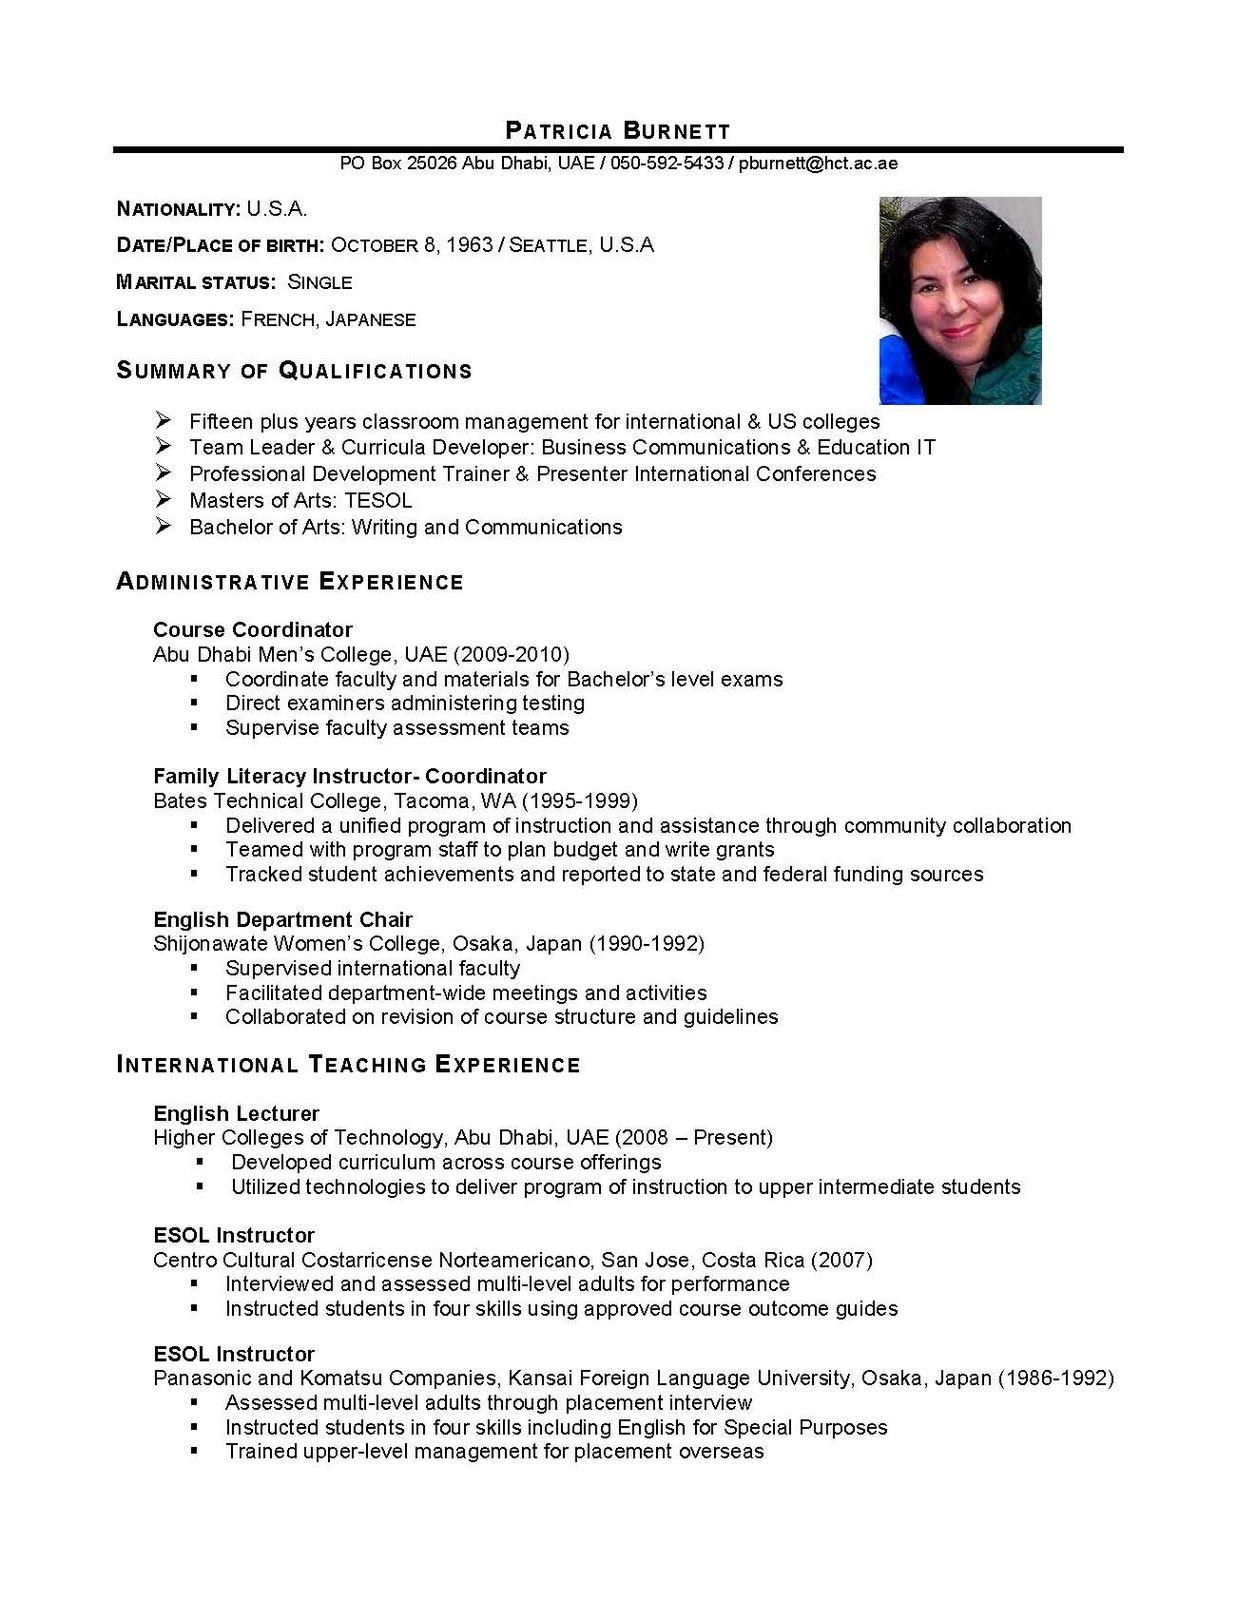 Latest cv format for job application create functional resume sample philippines standard altavistaventures Choice Image